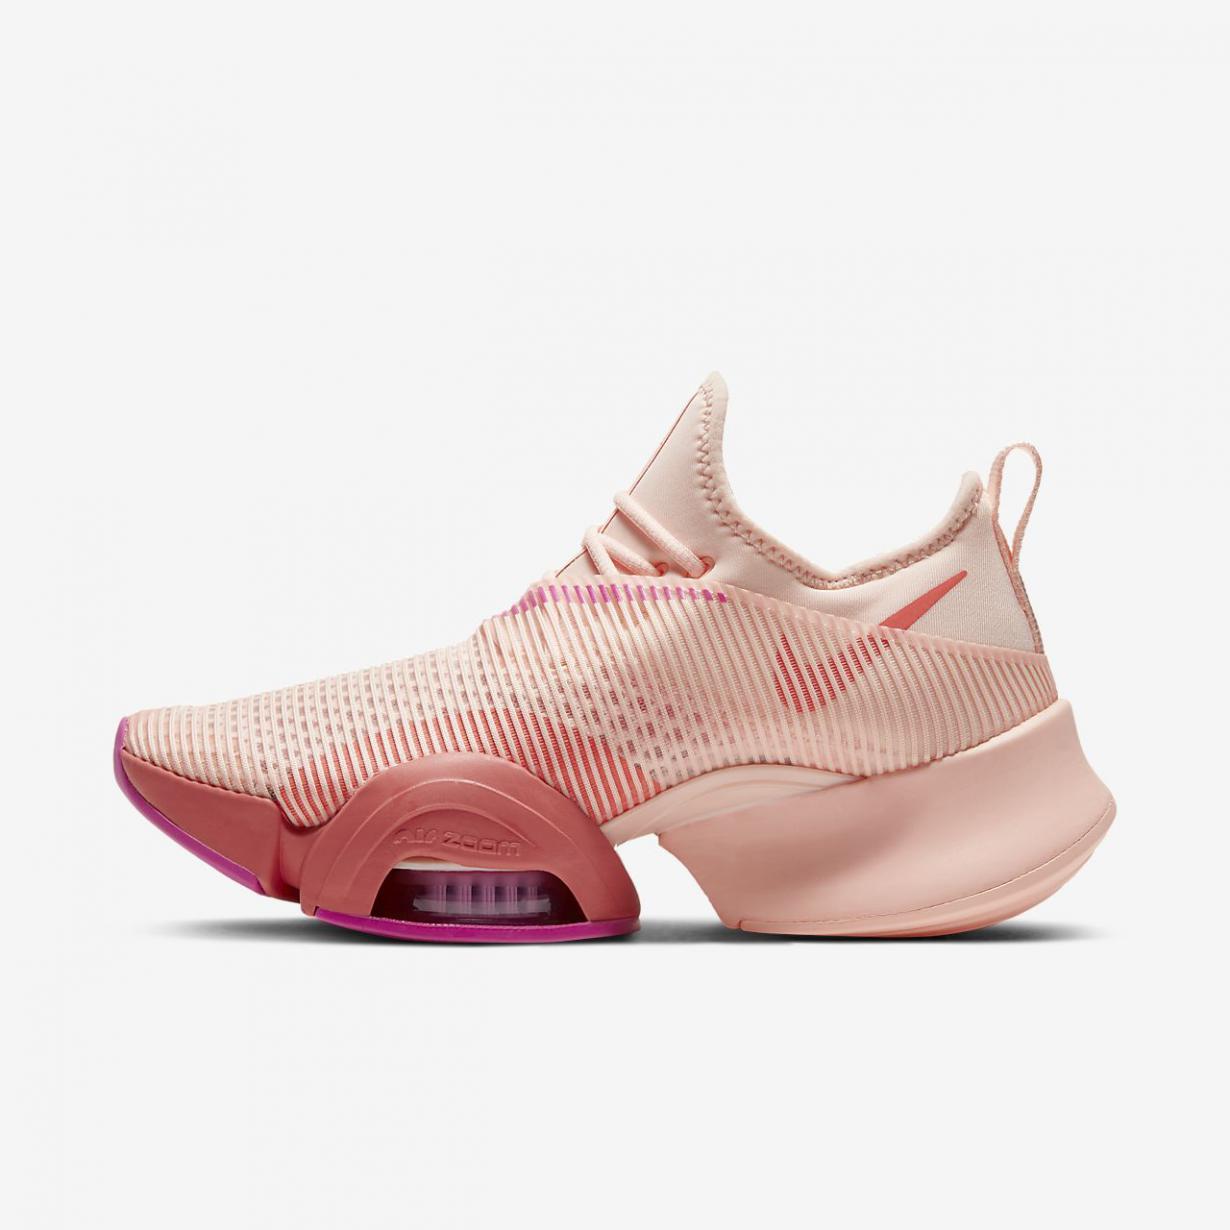 Training et fitness Femme | Air Zoom SuperRep Corail Délavé/Tison magique/Rose feu | Nike < Gooddaytricities